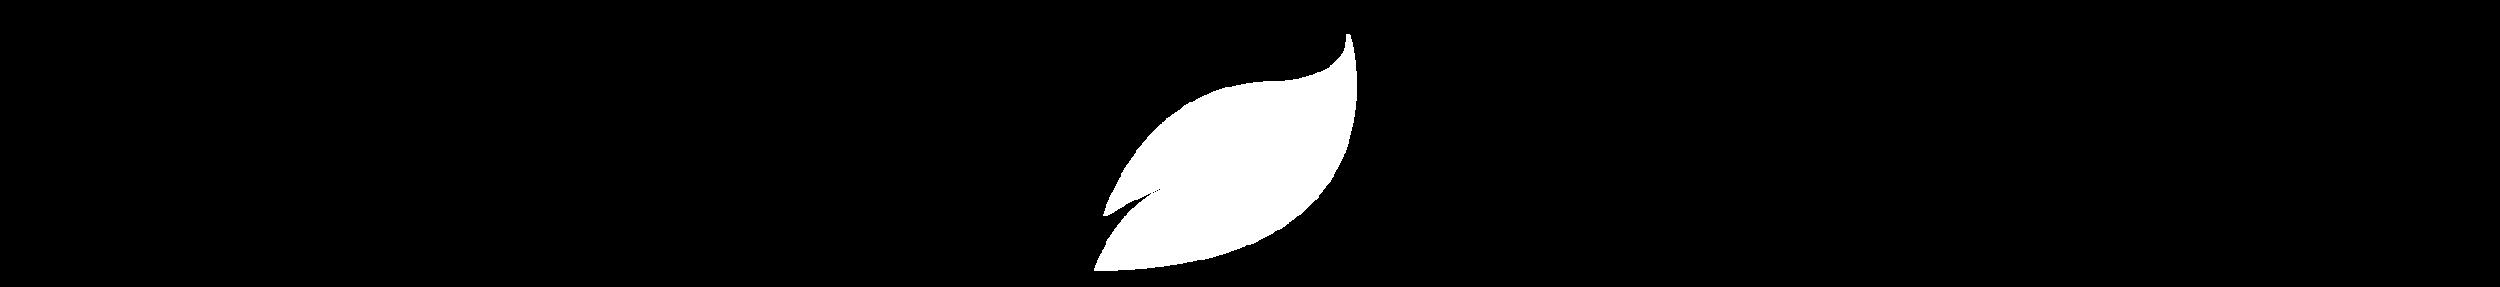 leaf2-01.png